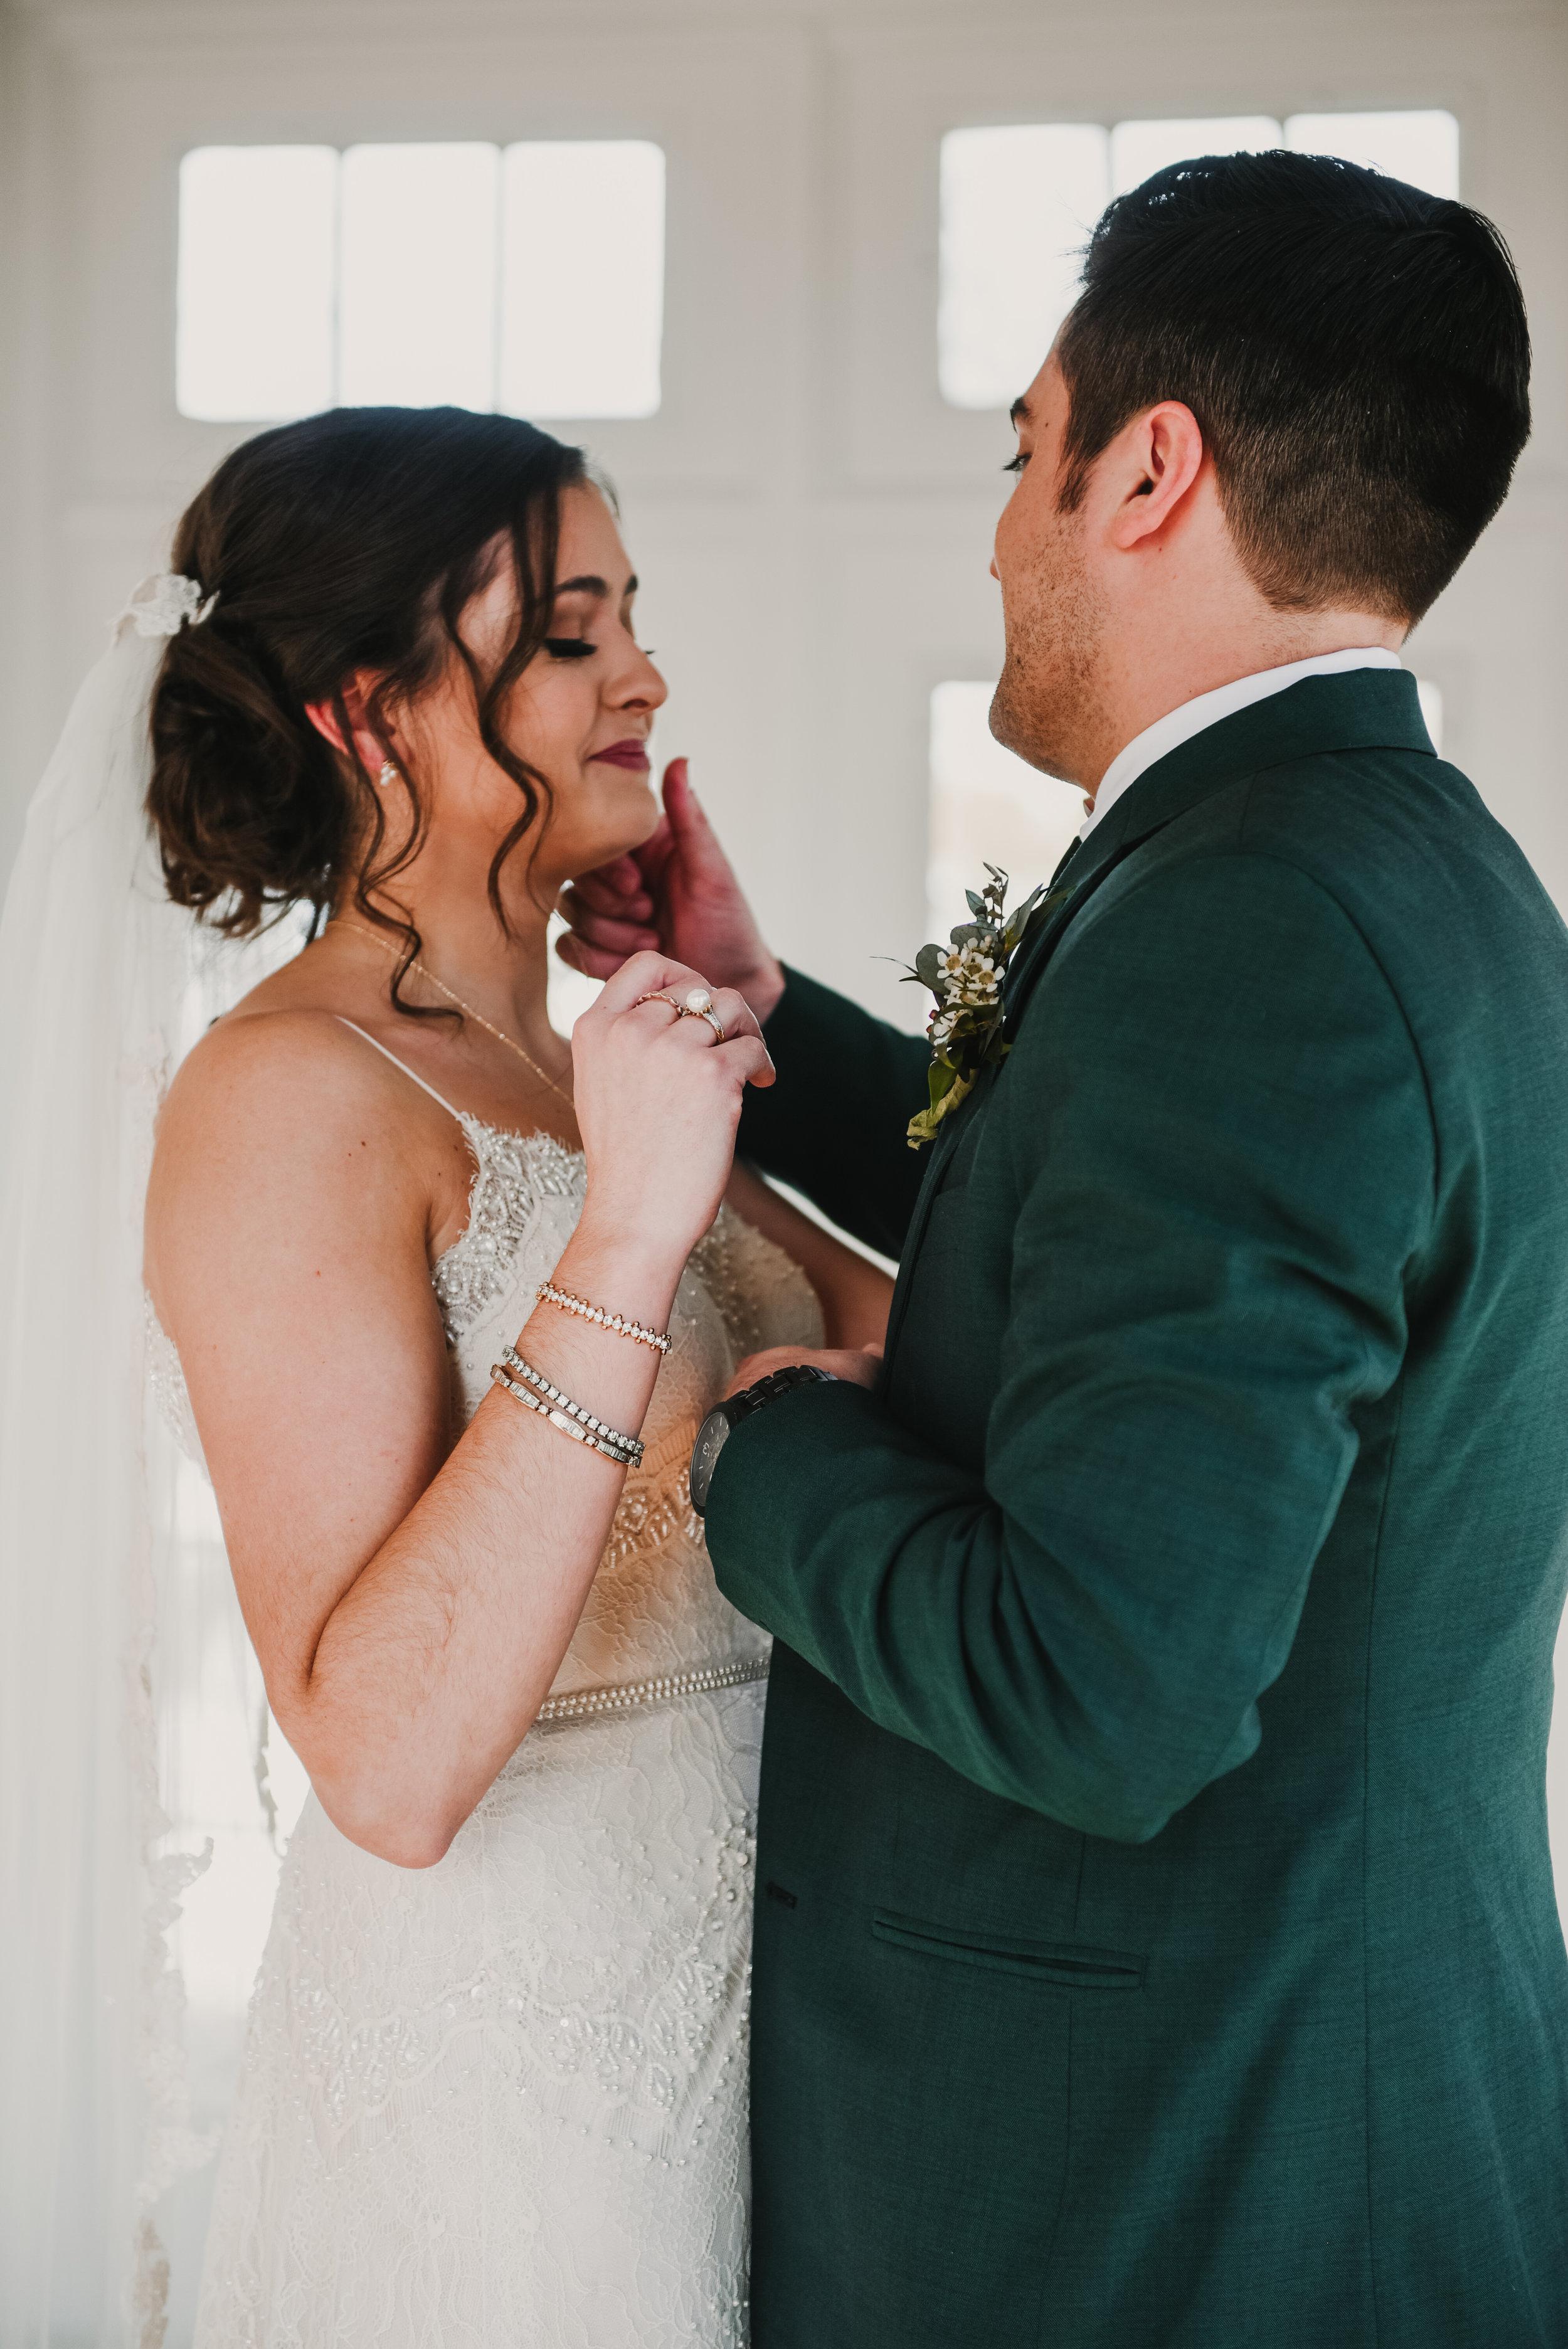 Groom wiping tear off of brides cheek